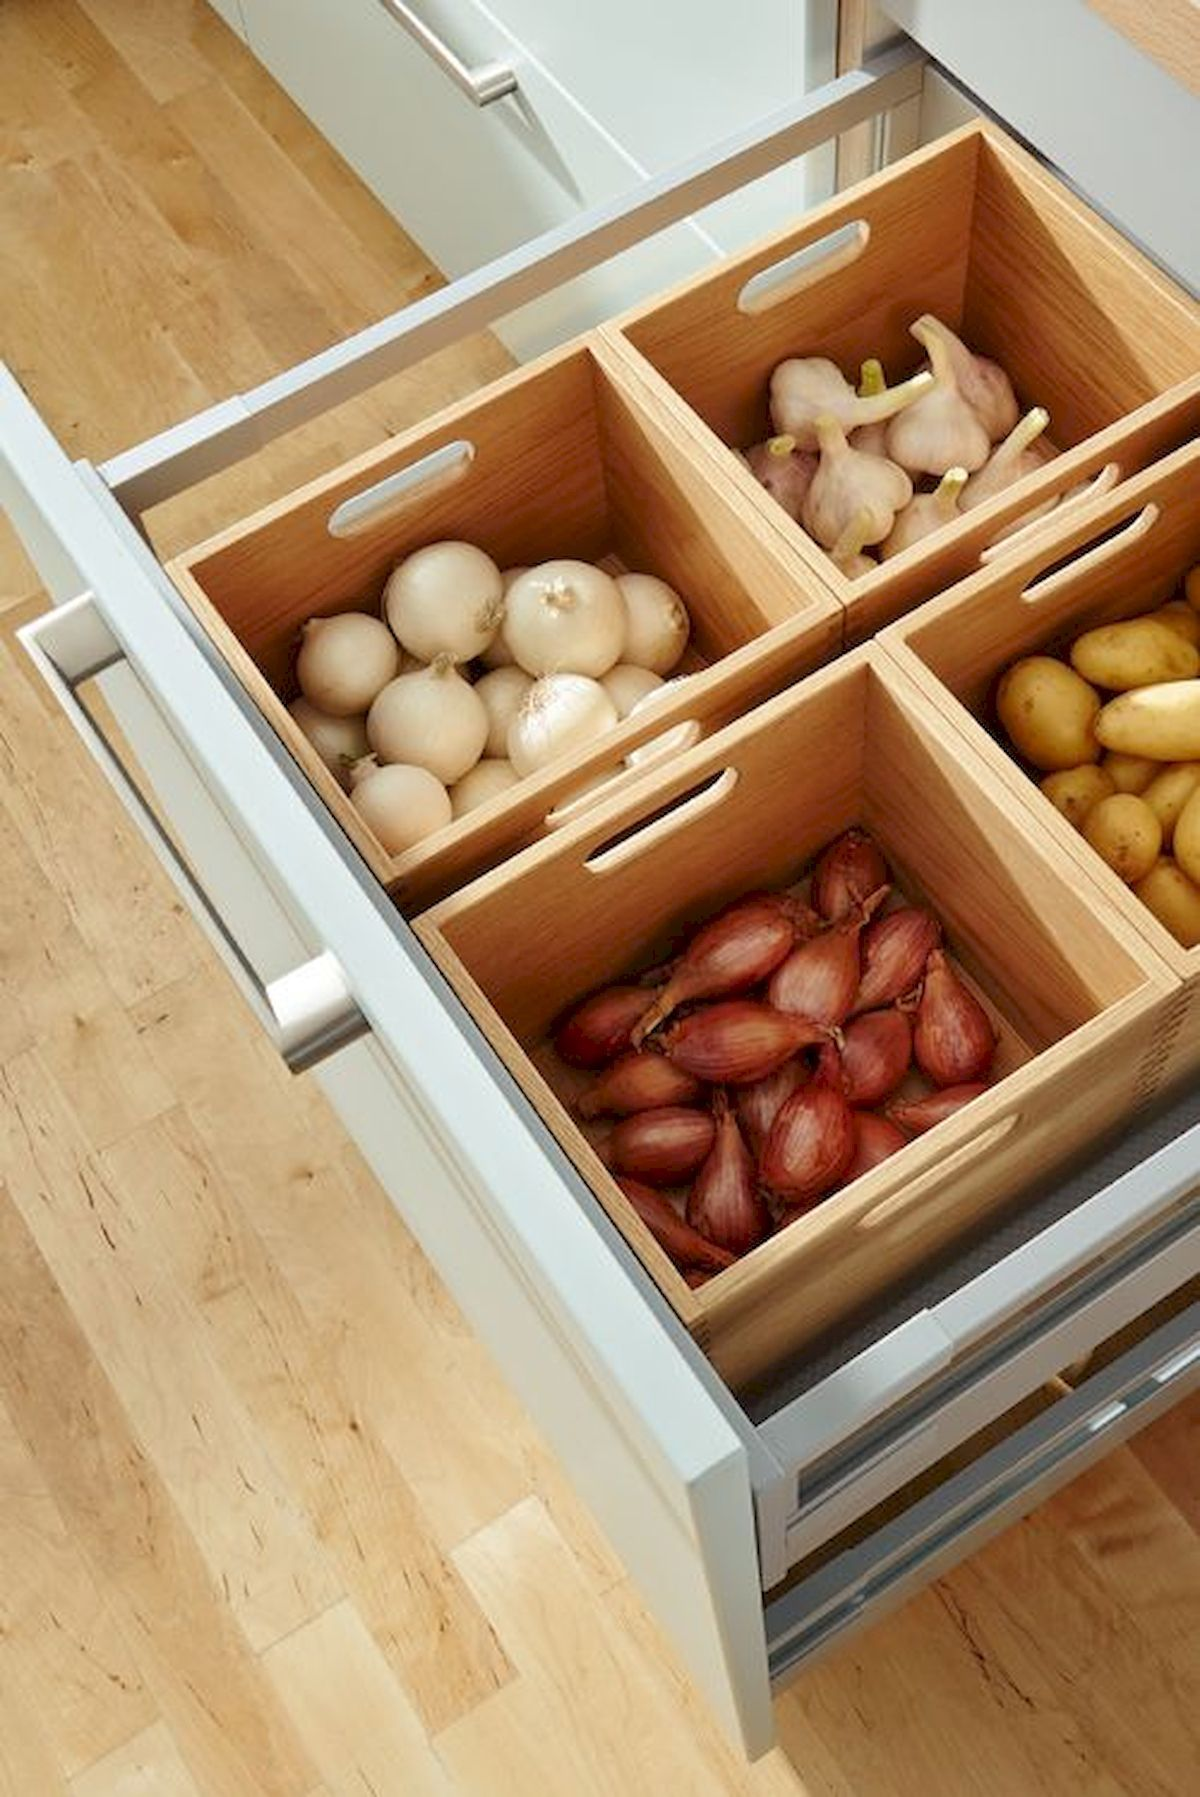 50 Gorgeous Rv Living Accessories Ideas Idee Rangement Cuisine Astuce Rangement Cuisine Cuisine Bricolage